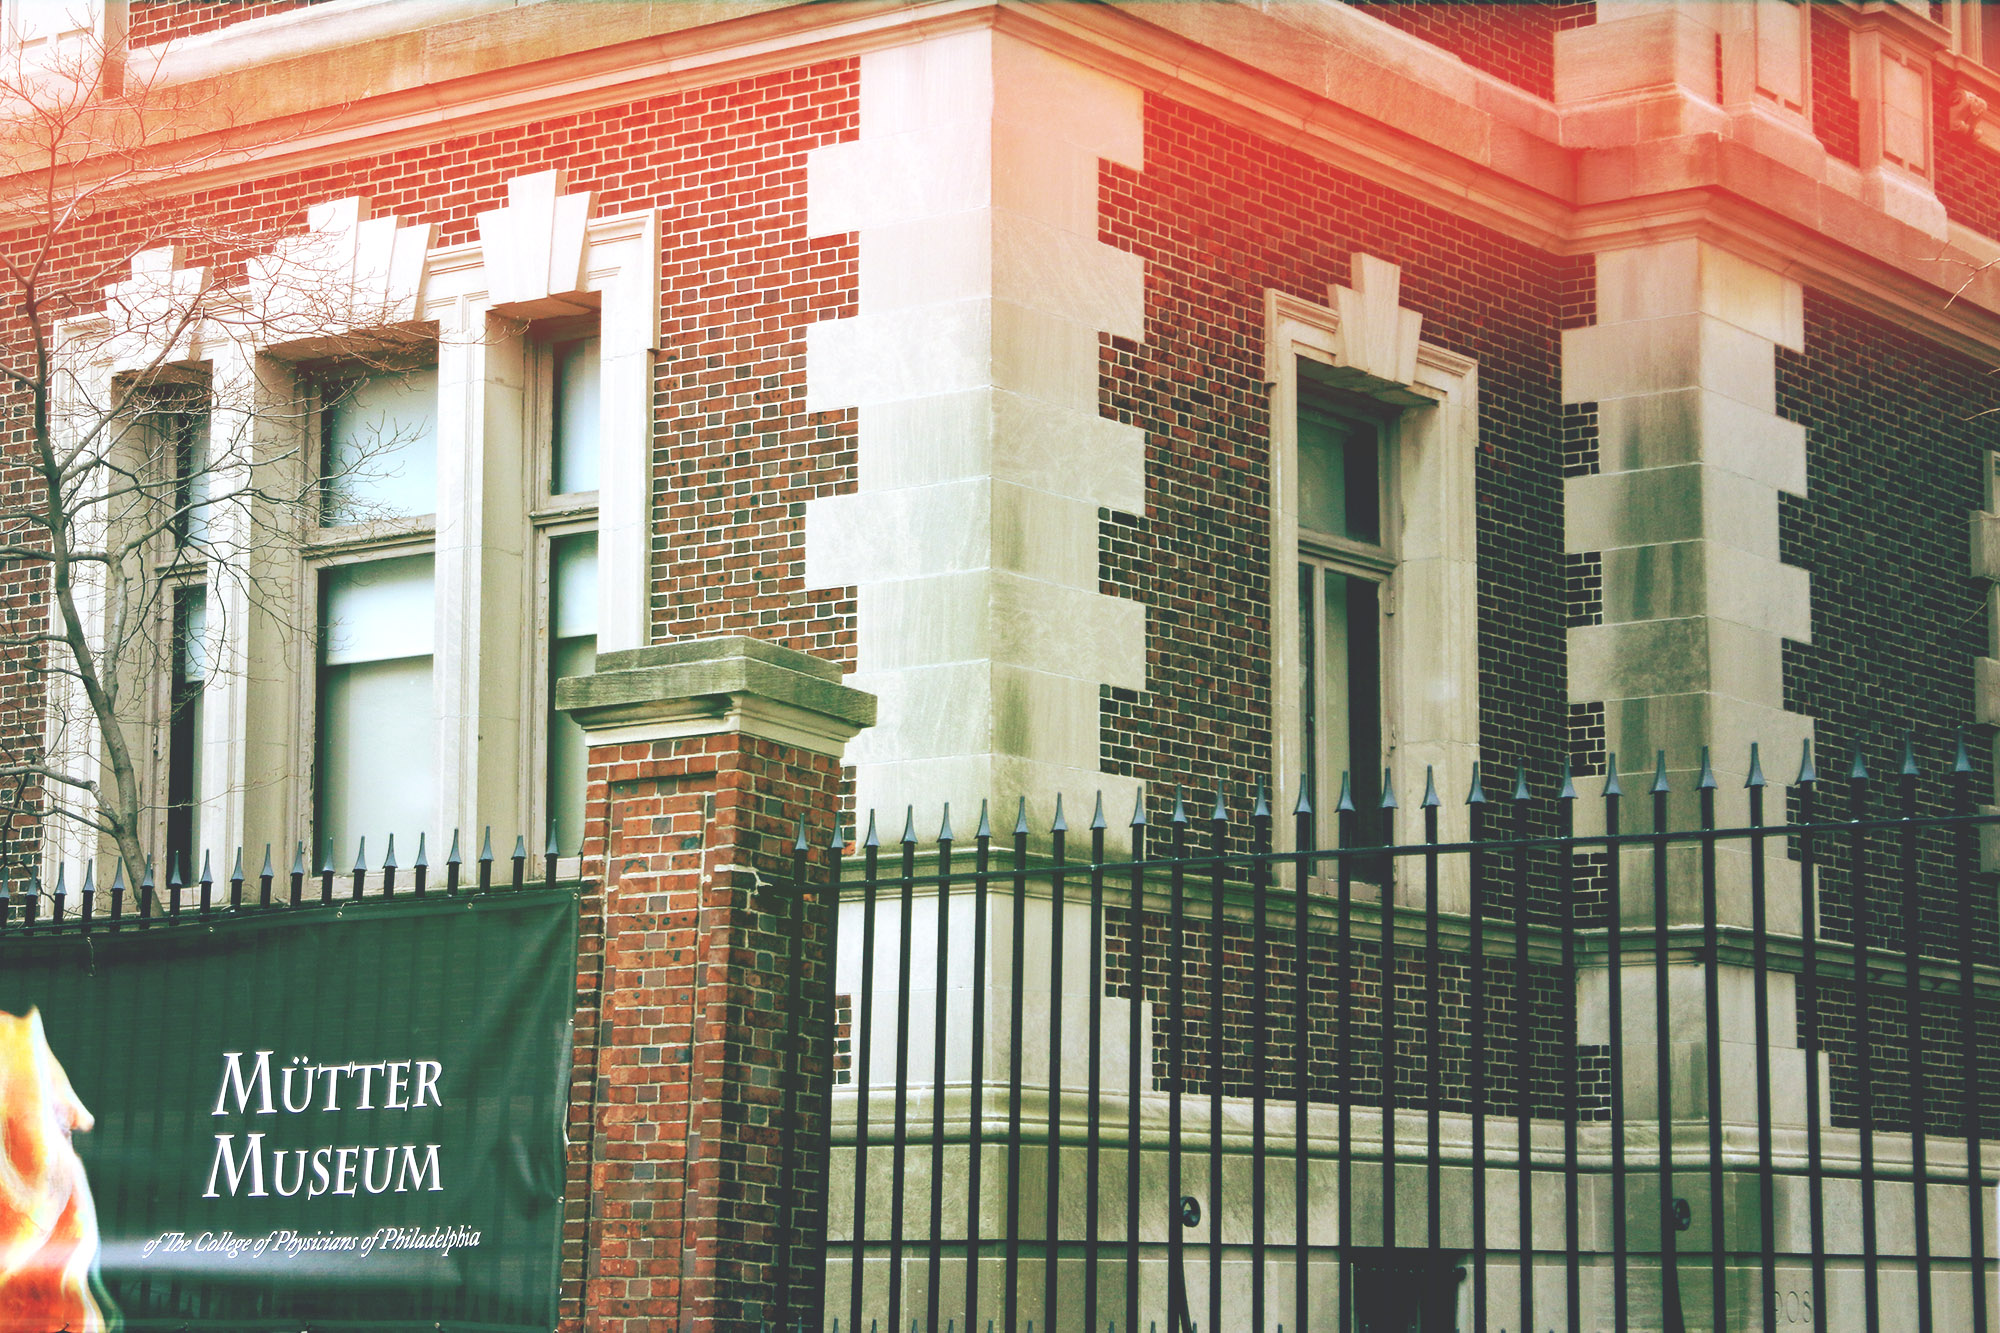 muttermuseum